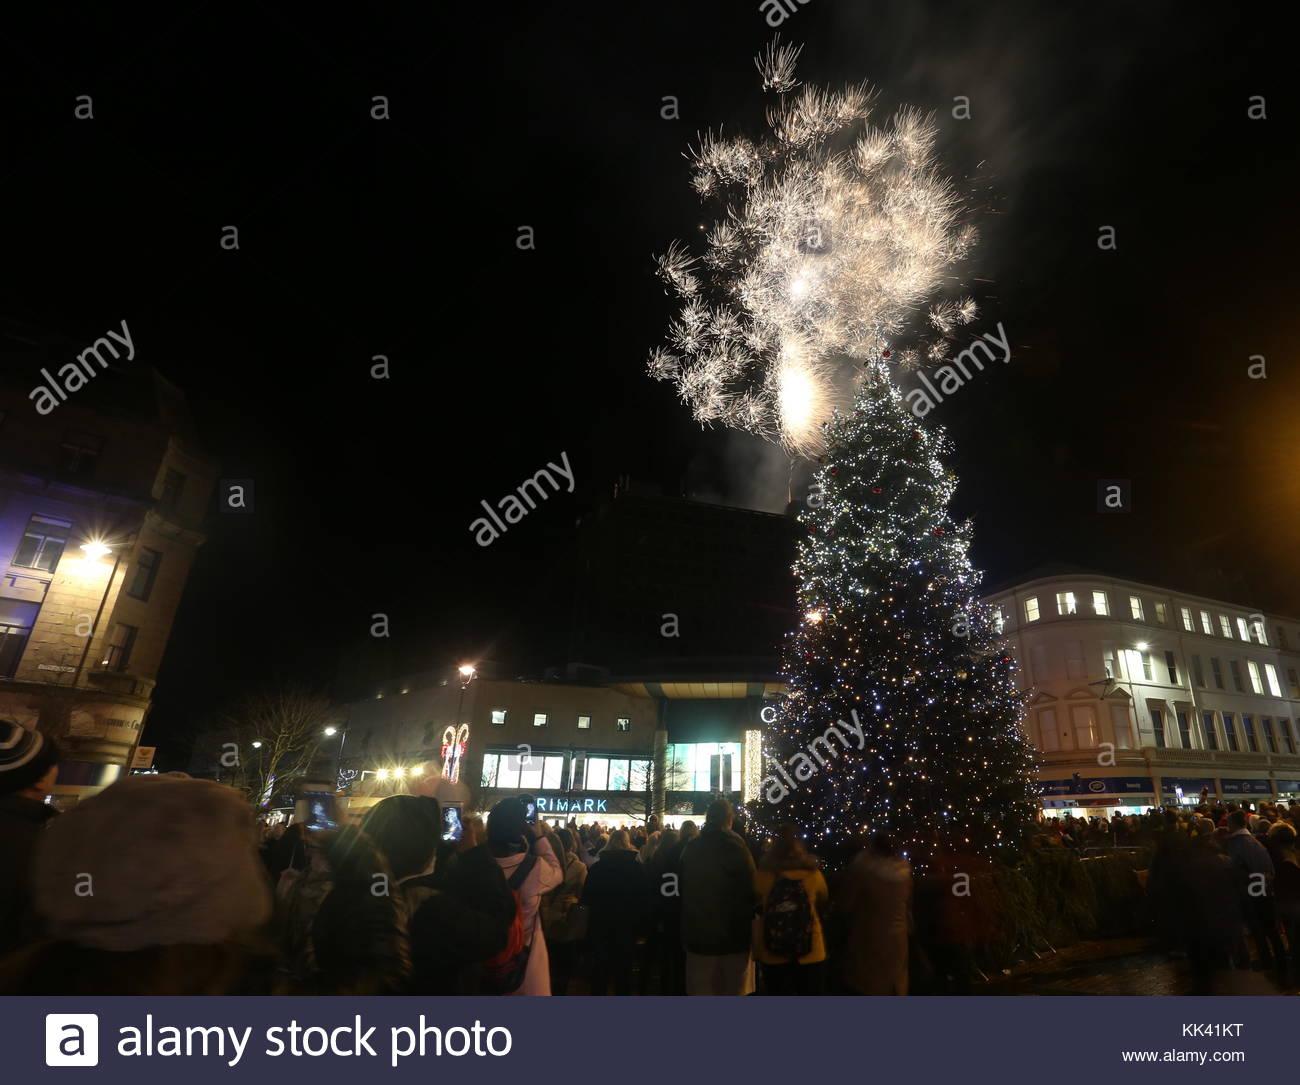 Fireworks and Christmas tree Dundee Scotland  24th November 2017 - Stock Image